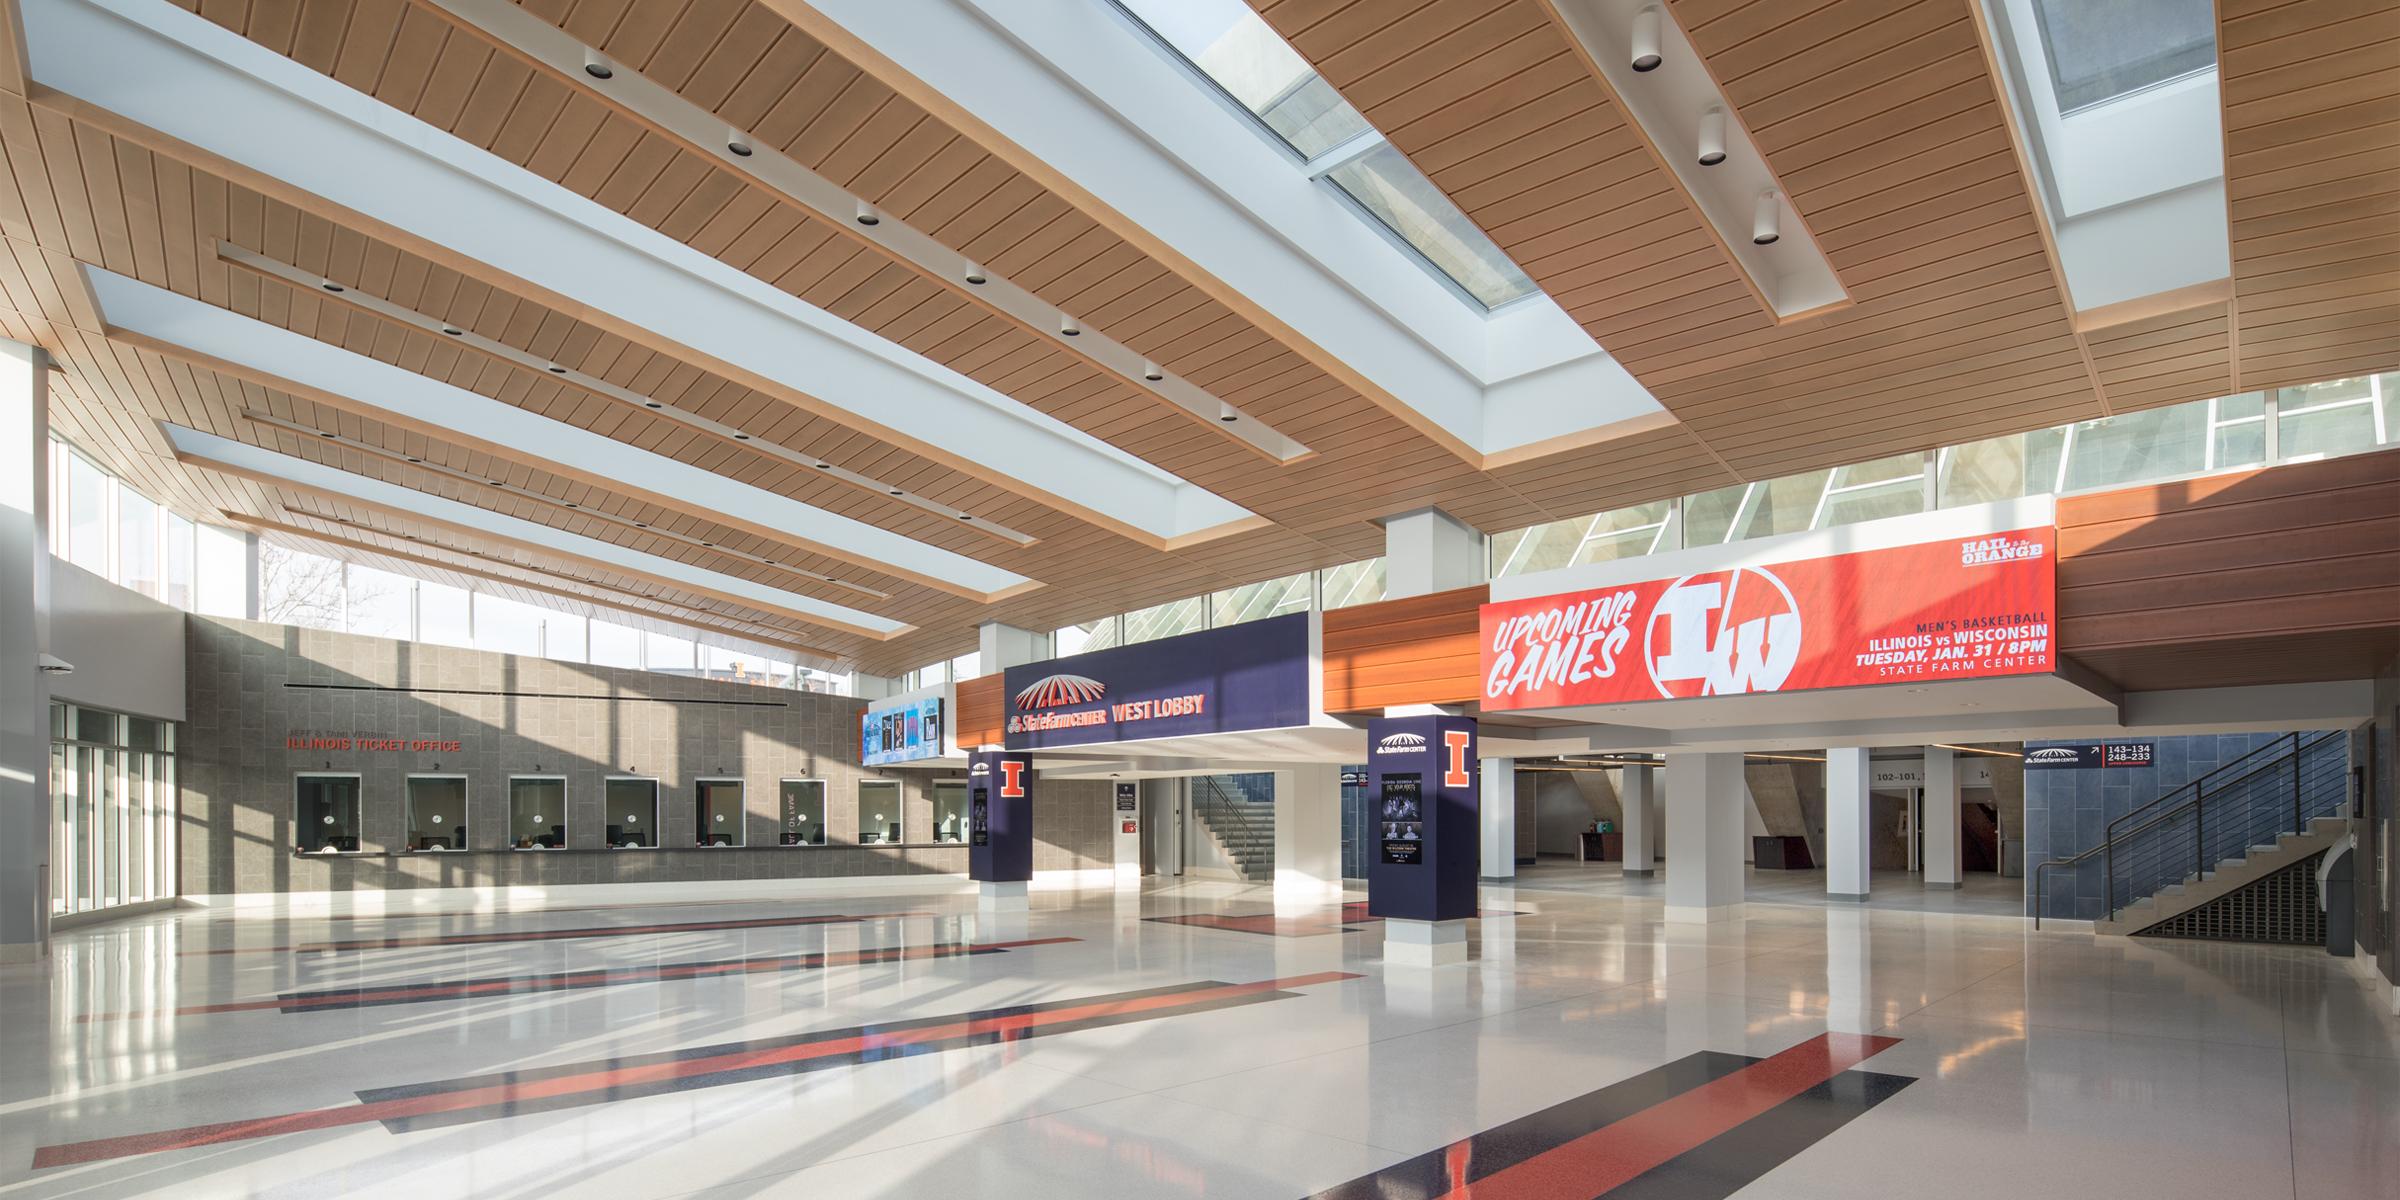 SFC_West Lobby.jpg